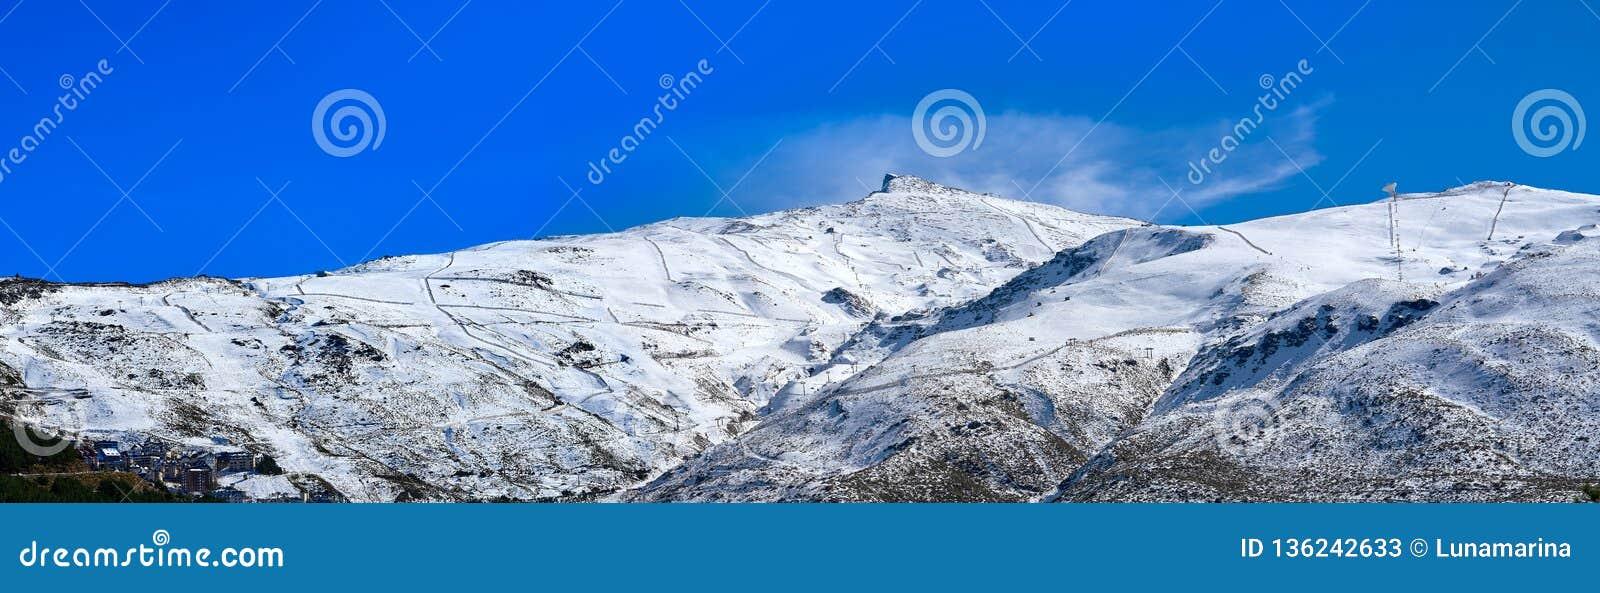 Station De Sports D Hiver De Montagne De Sierra Nevada Grenade Image Stock Image Du Hiver Grenade 136242633